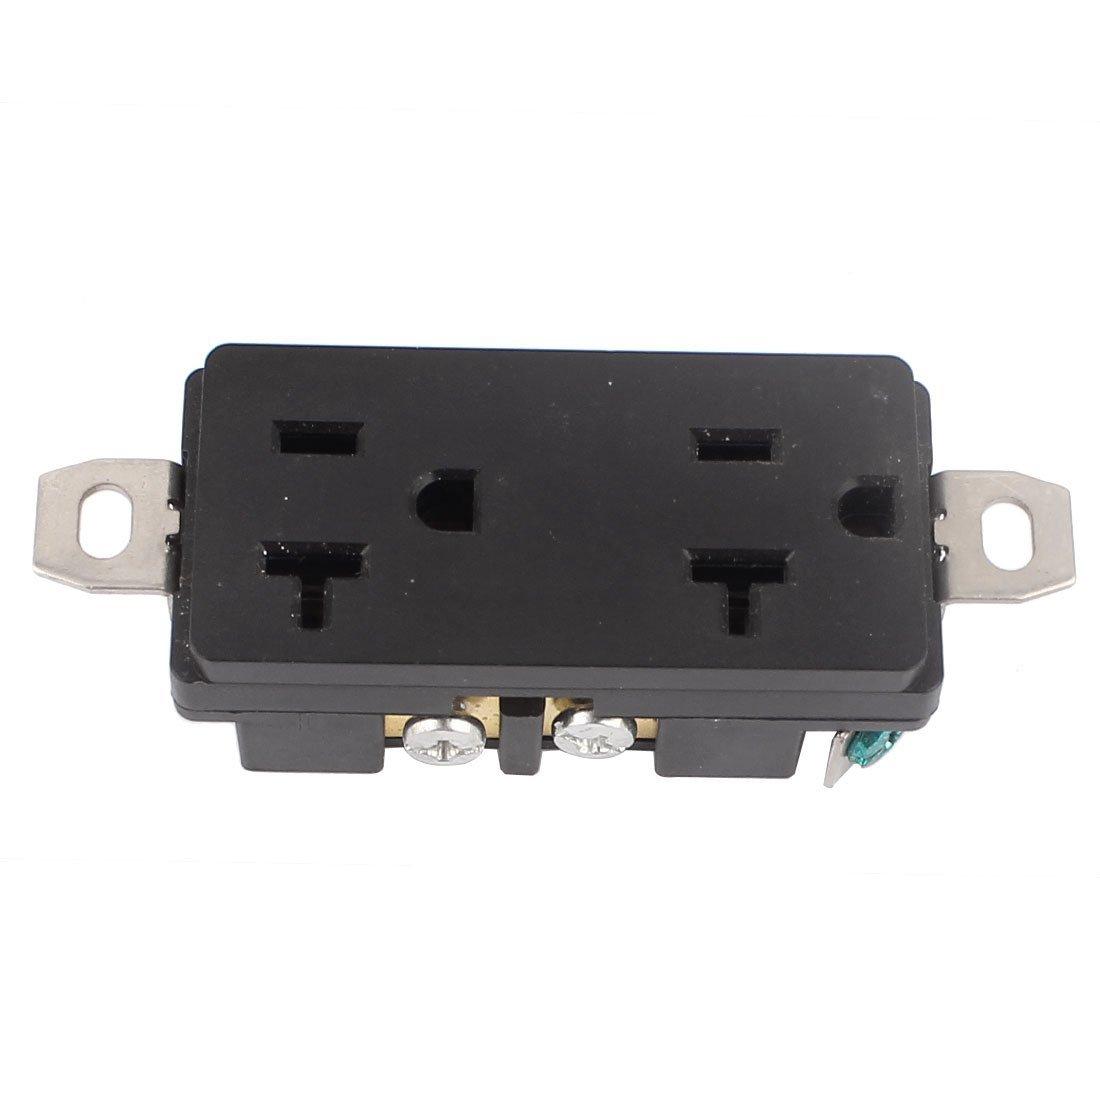 DealMux 125V 20A Wall Mount Twist Lock Straight Tamper Resistant Duplex Receptacle